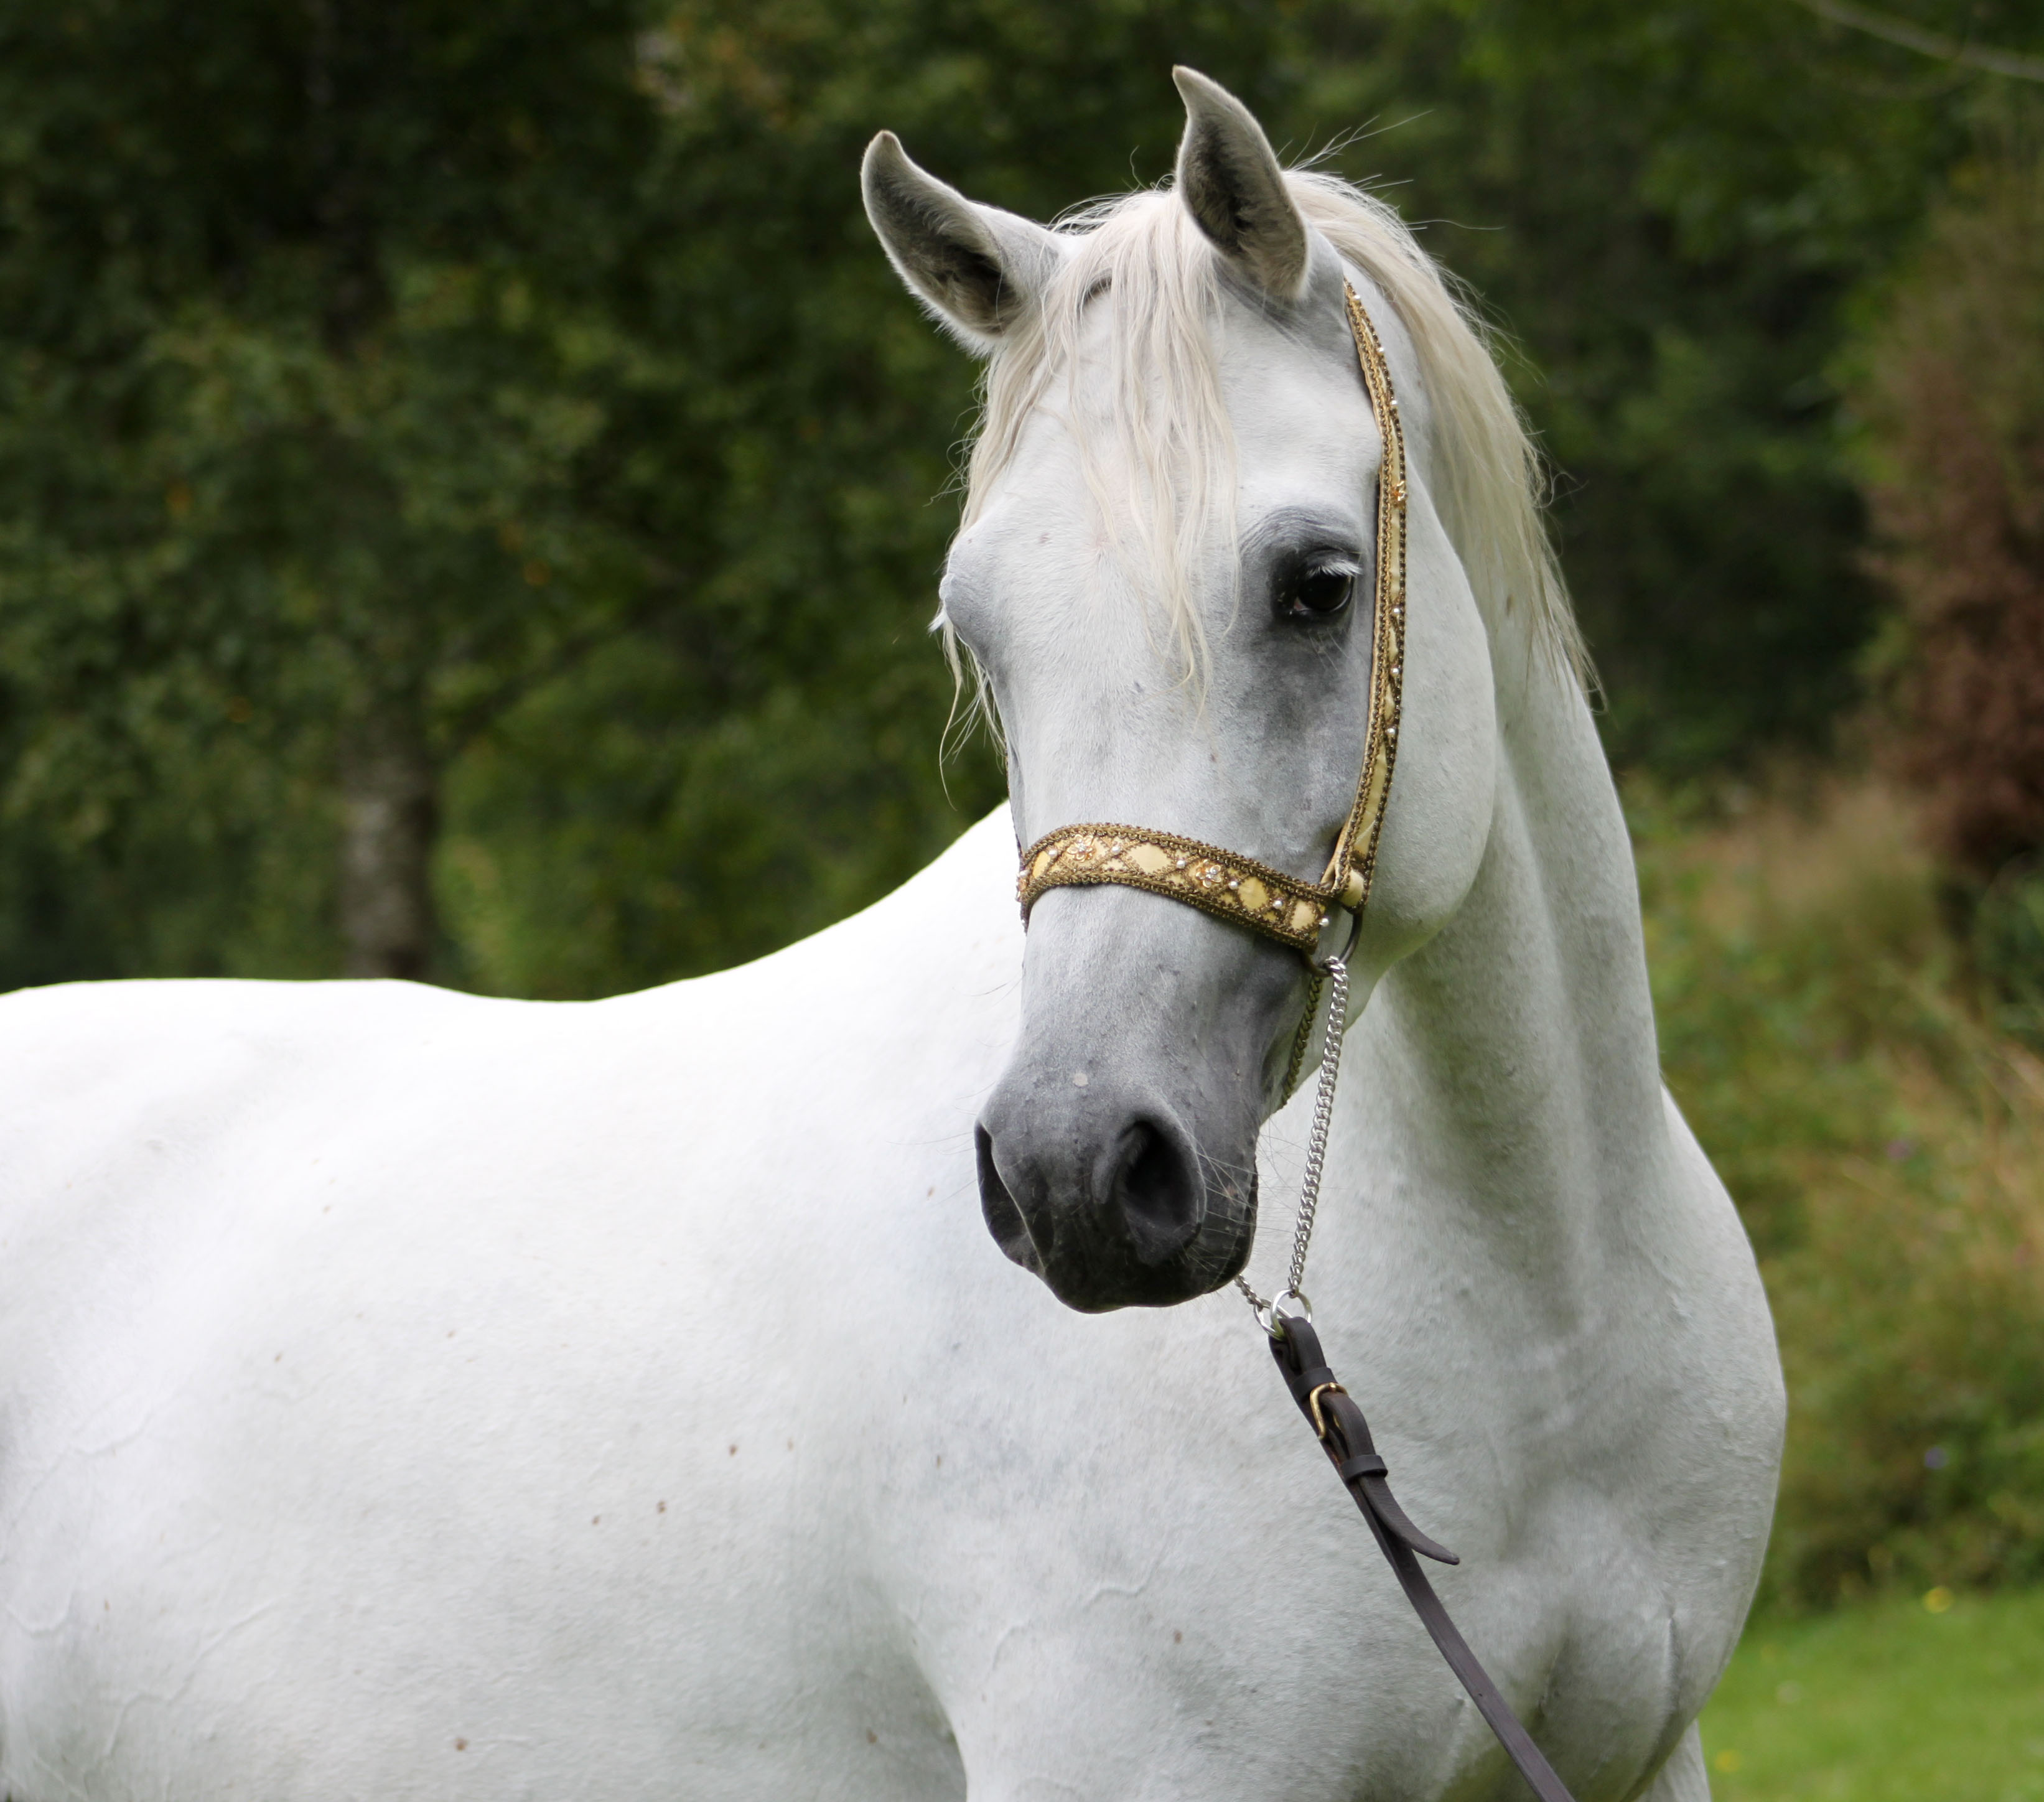 Pretty Arabian Horse wallpaper ForWallpapercom 3285x2896